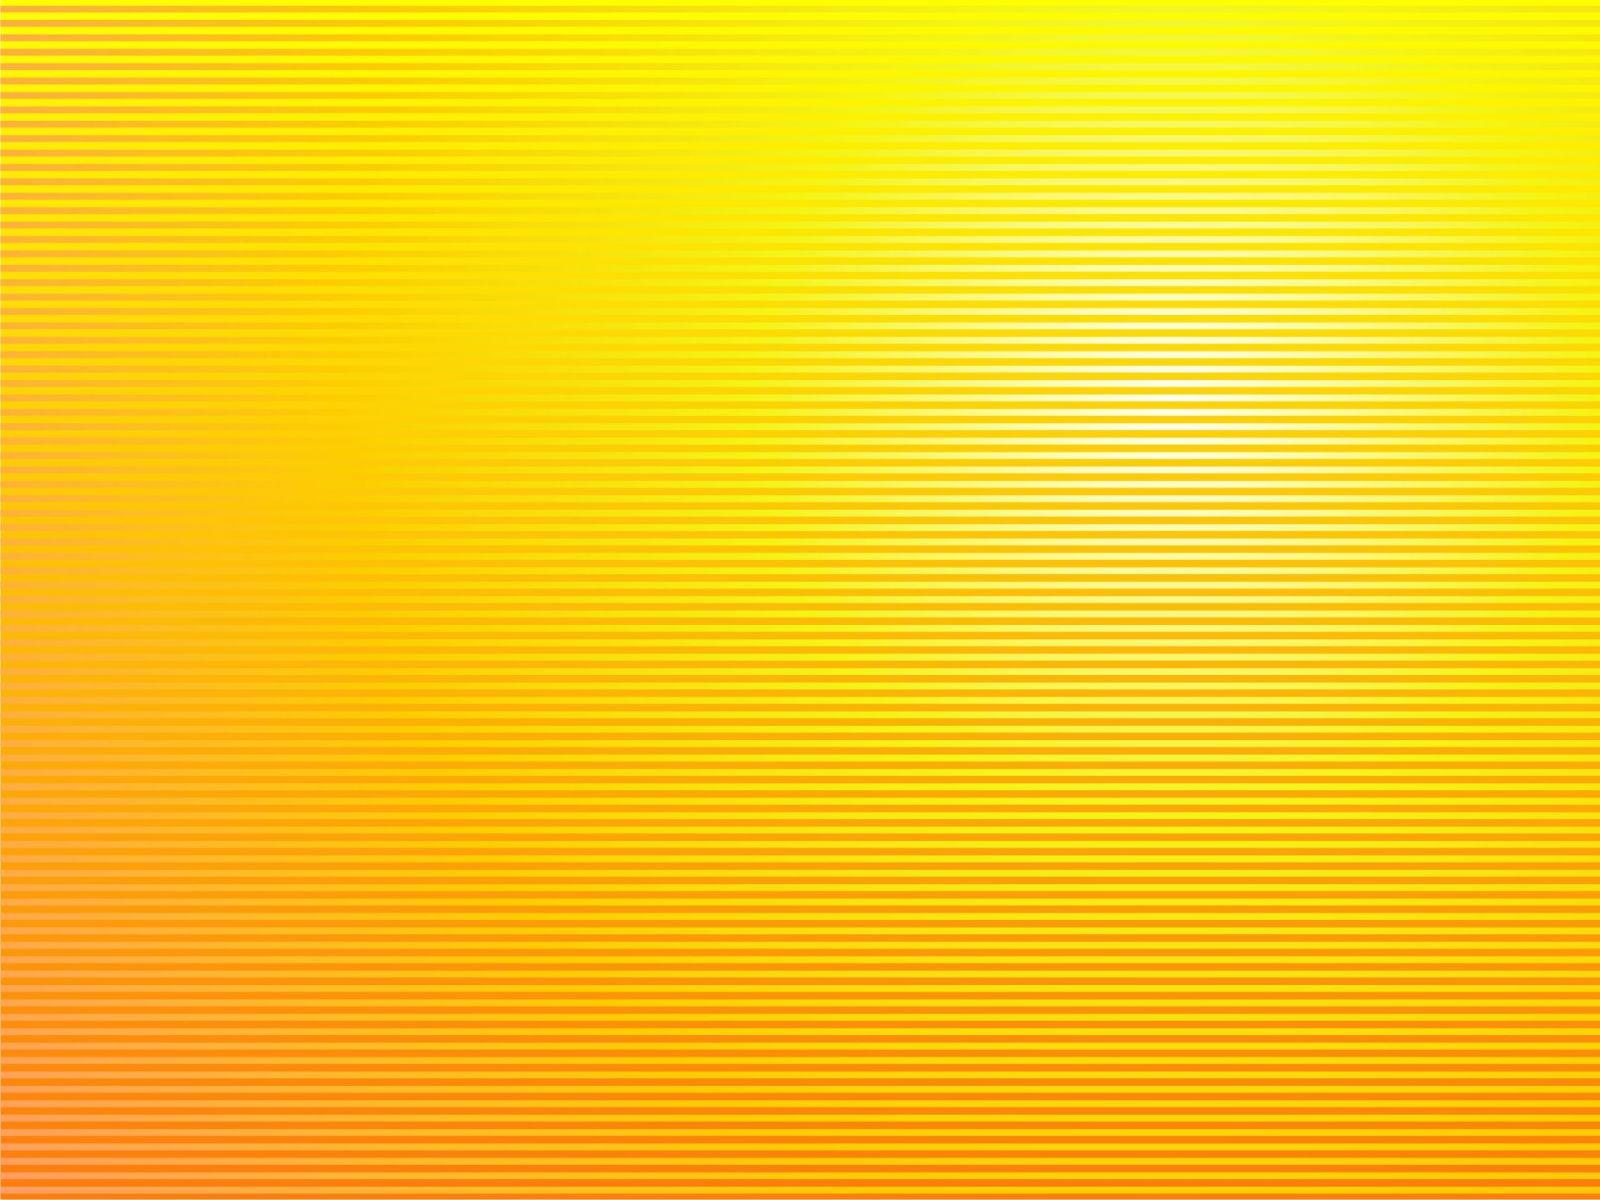 Yellow Background 5097